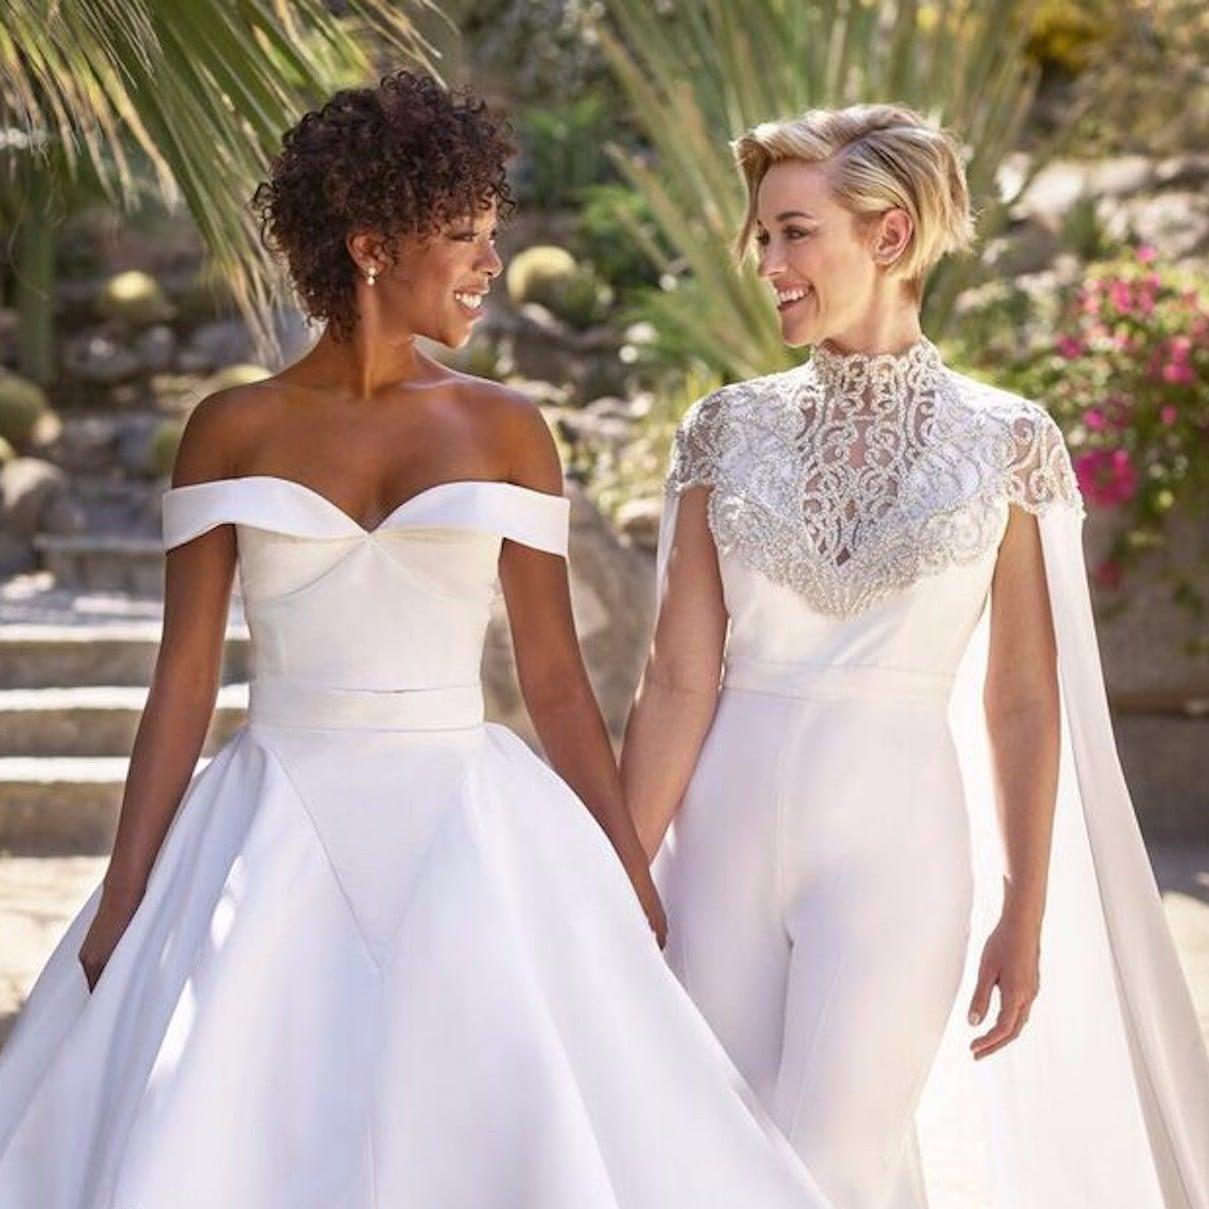 Borrow Wedding Dress 18 Marvelous